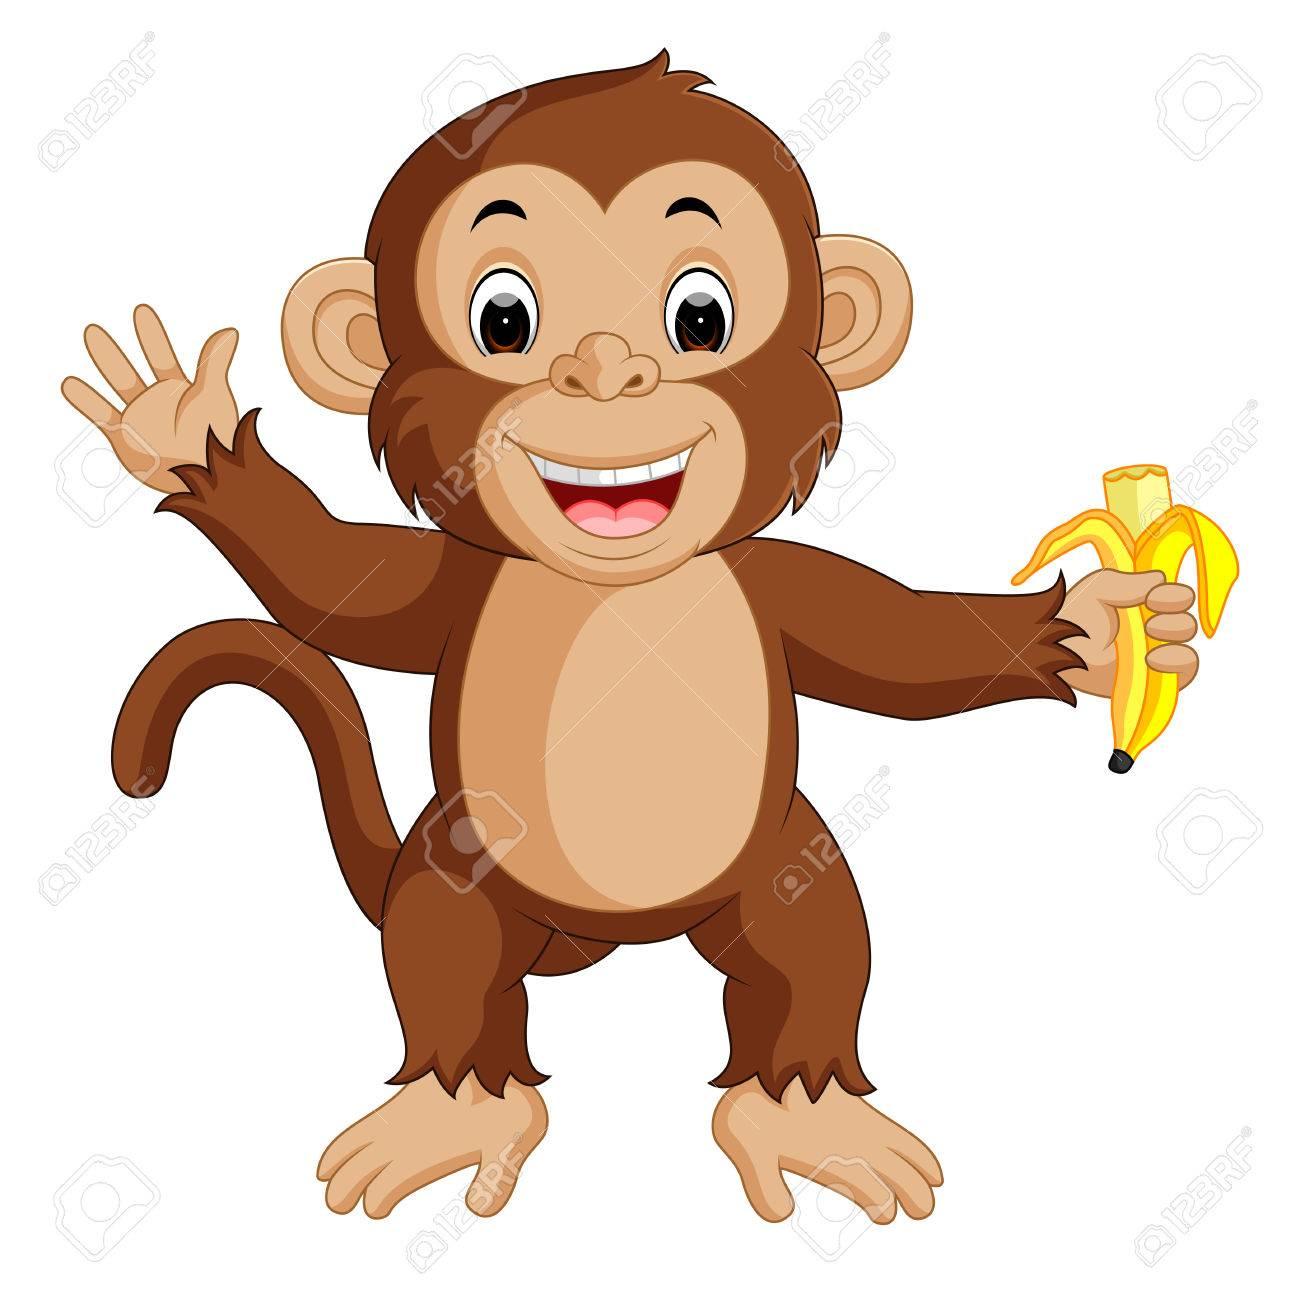 cute monkey cartoon eating banana stock photo picture and royalty rh 123rf com printable cartoon monkey pictures cartoon monkey pictures to print